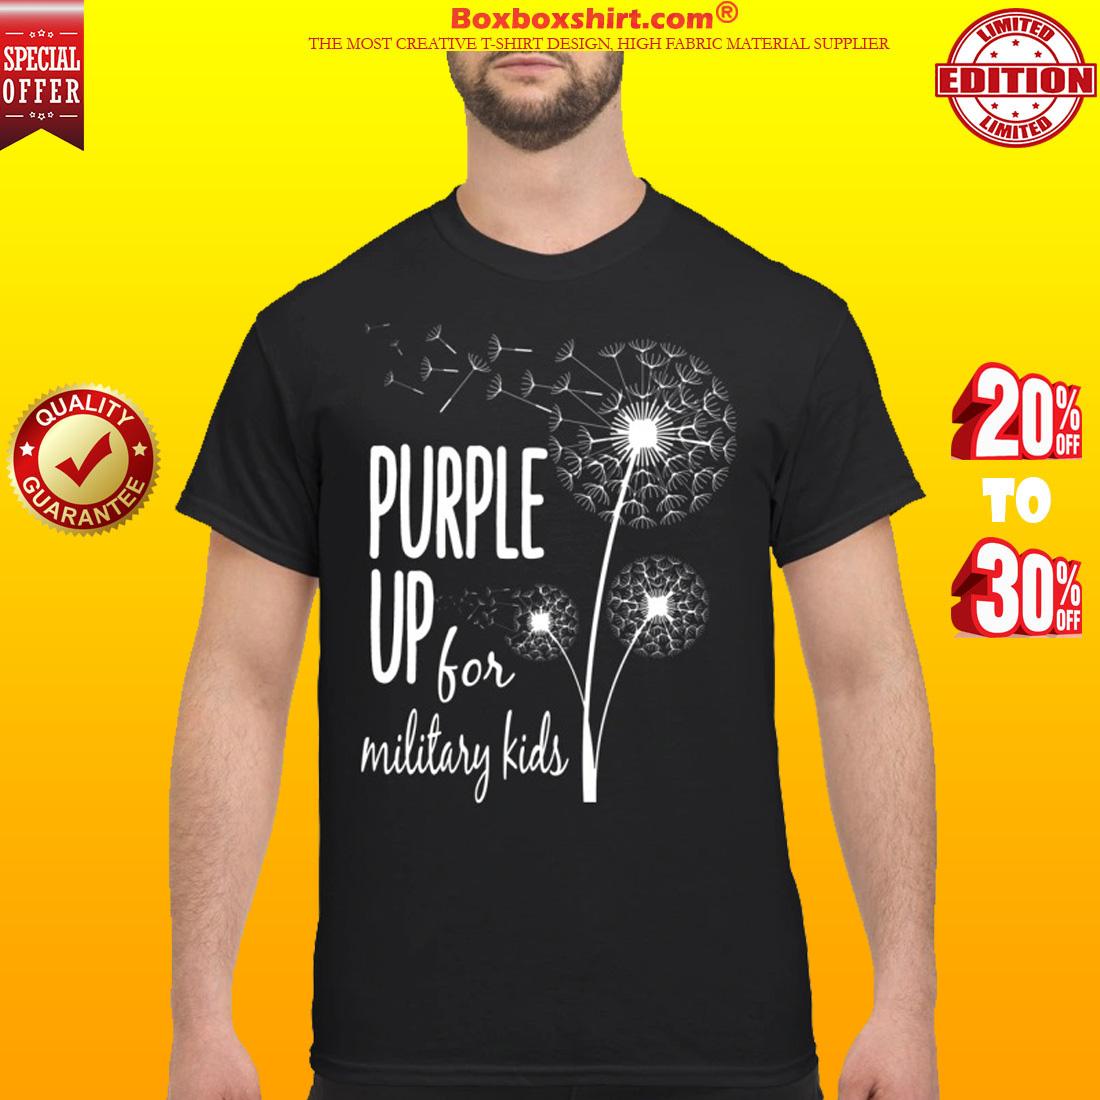 Dandelion purple up for military kids classic shirt